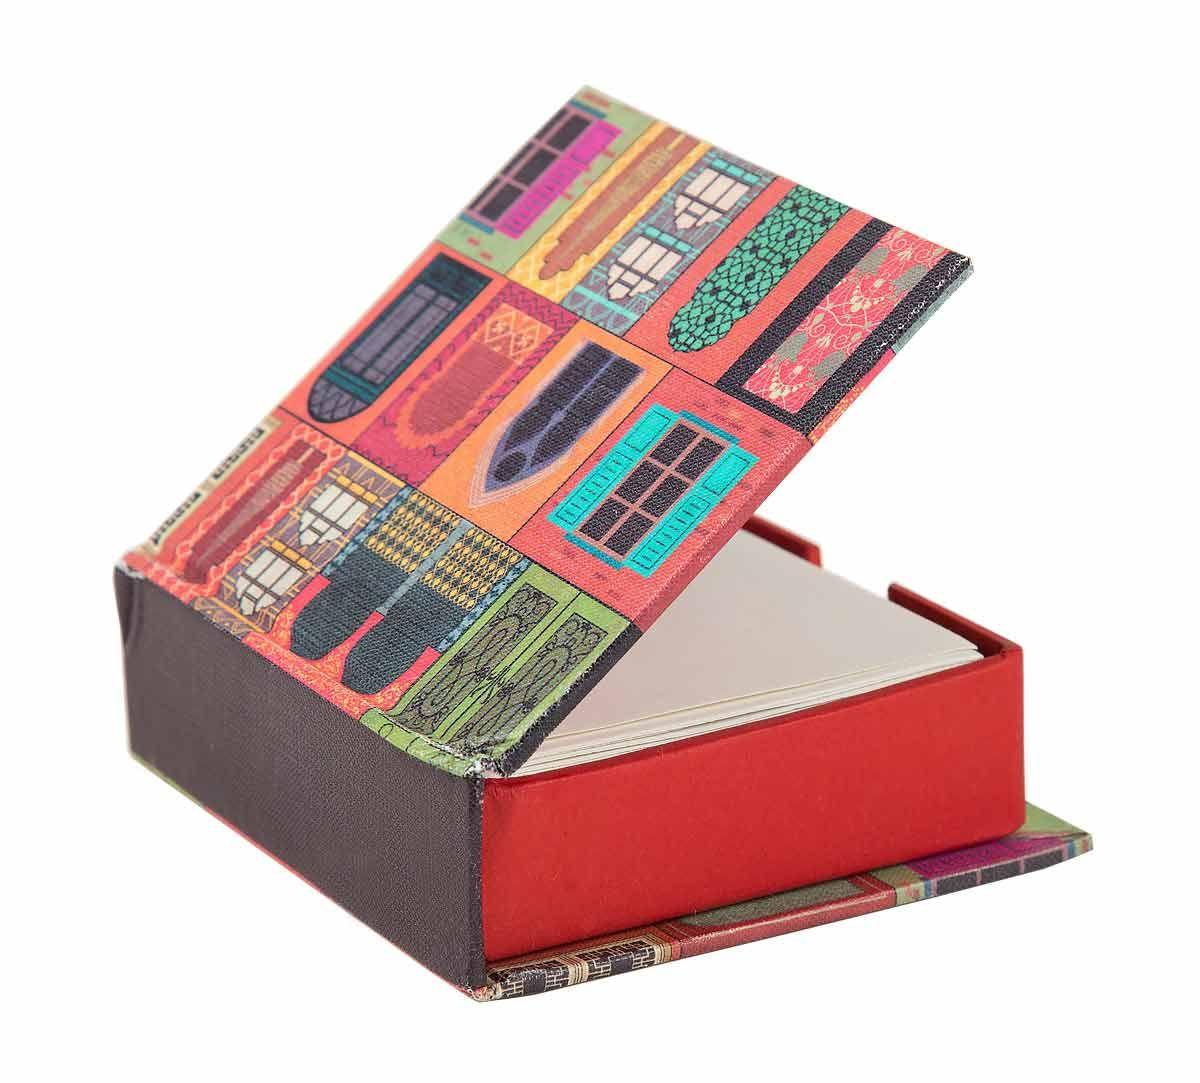 India Circus Mughal Doors Reiteration Memo Pad Box